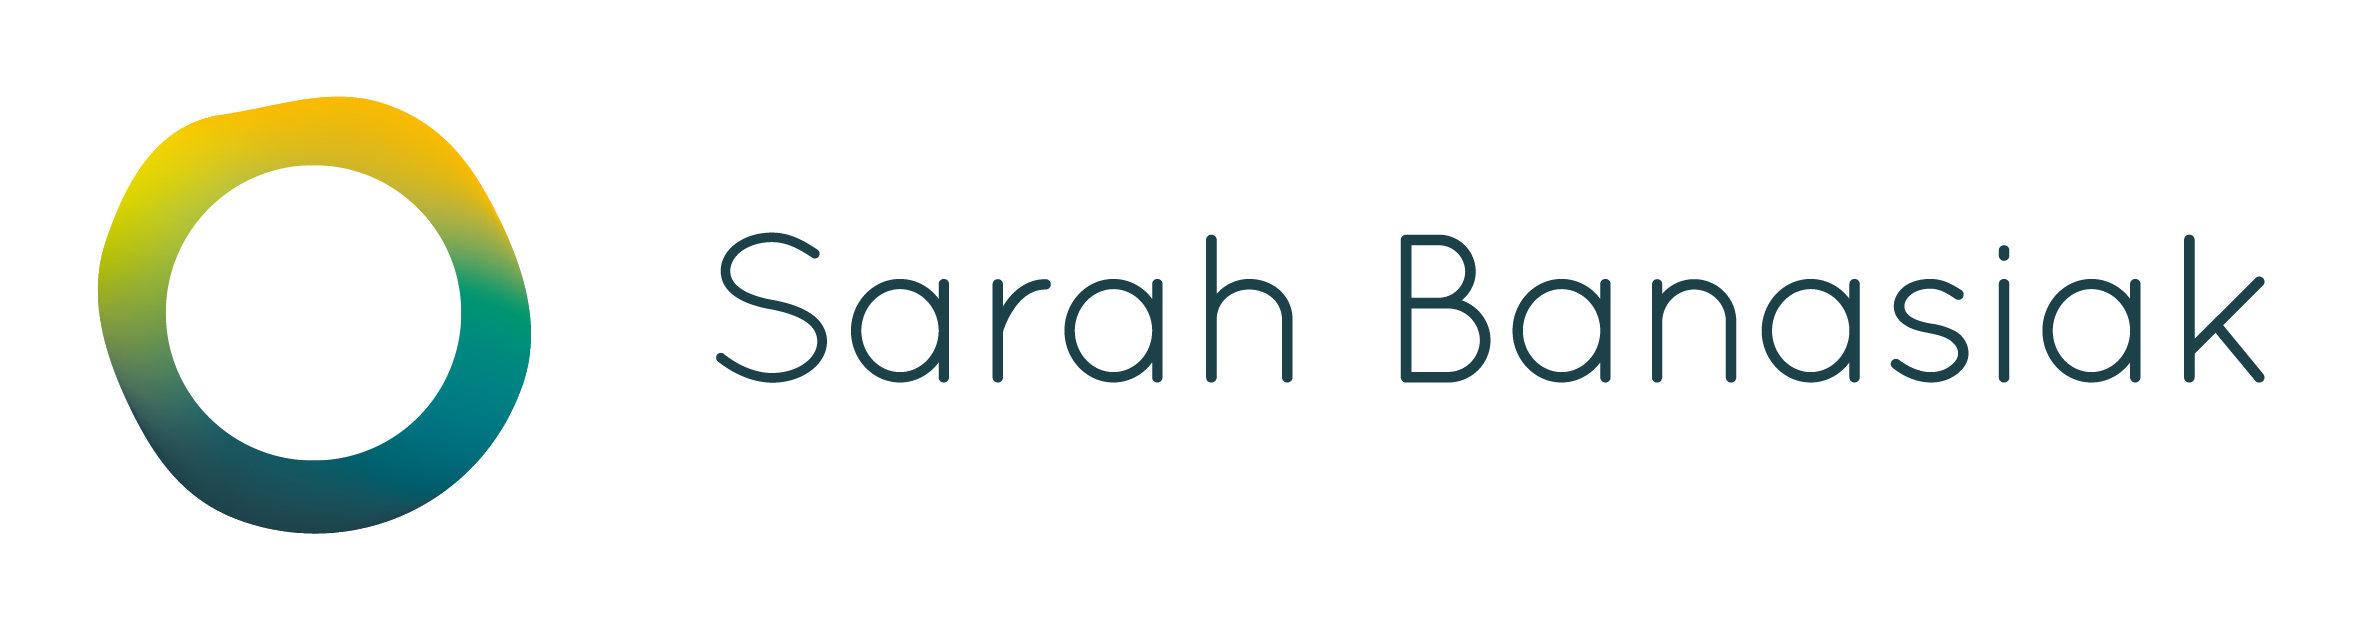 Logo_Sarah_Banasiak_-01